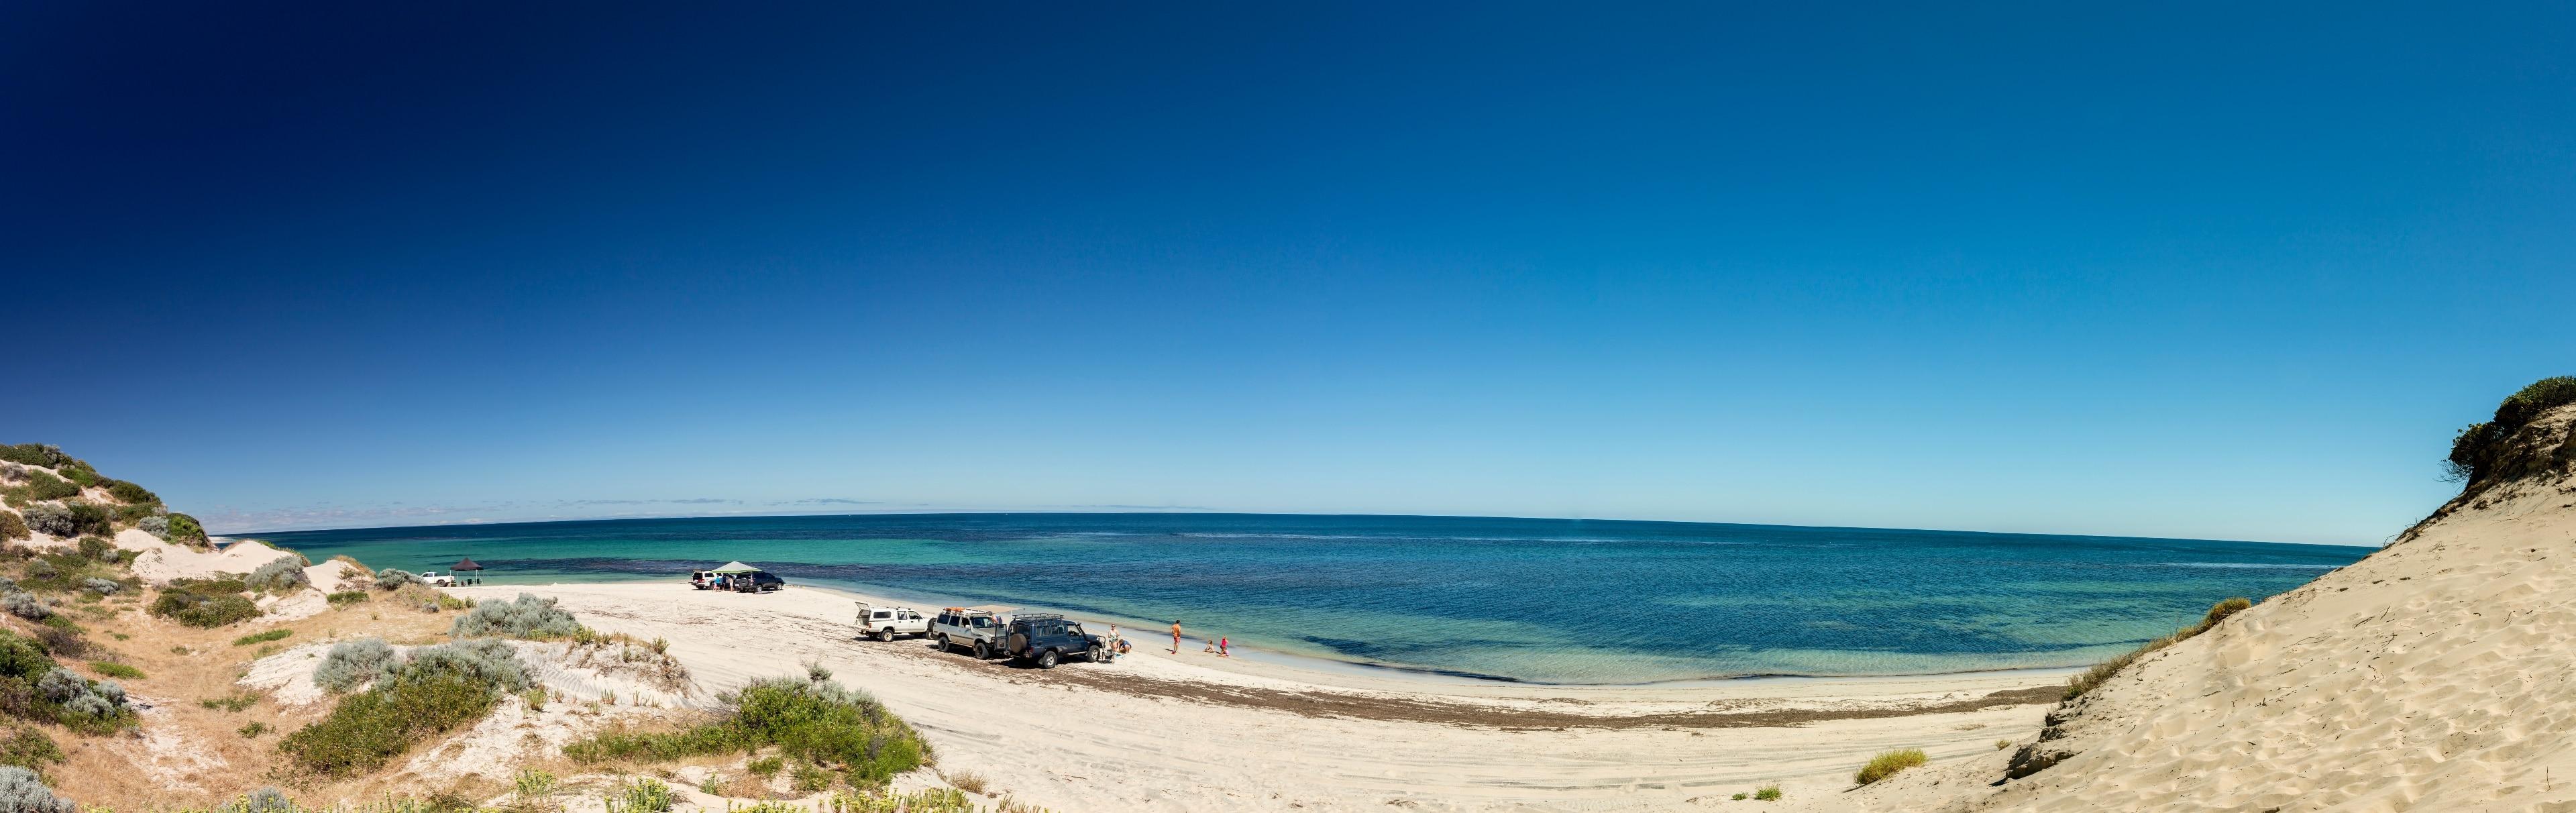 Peppermint Grove Beach, Western Australia, Australien